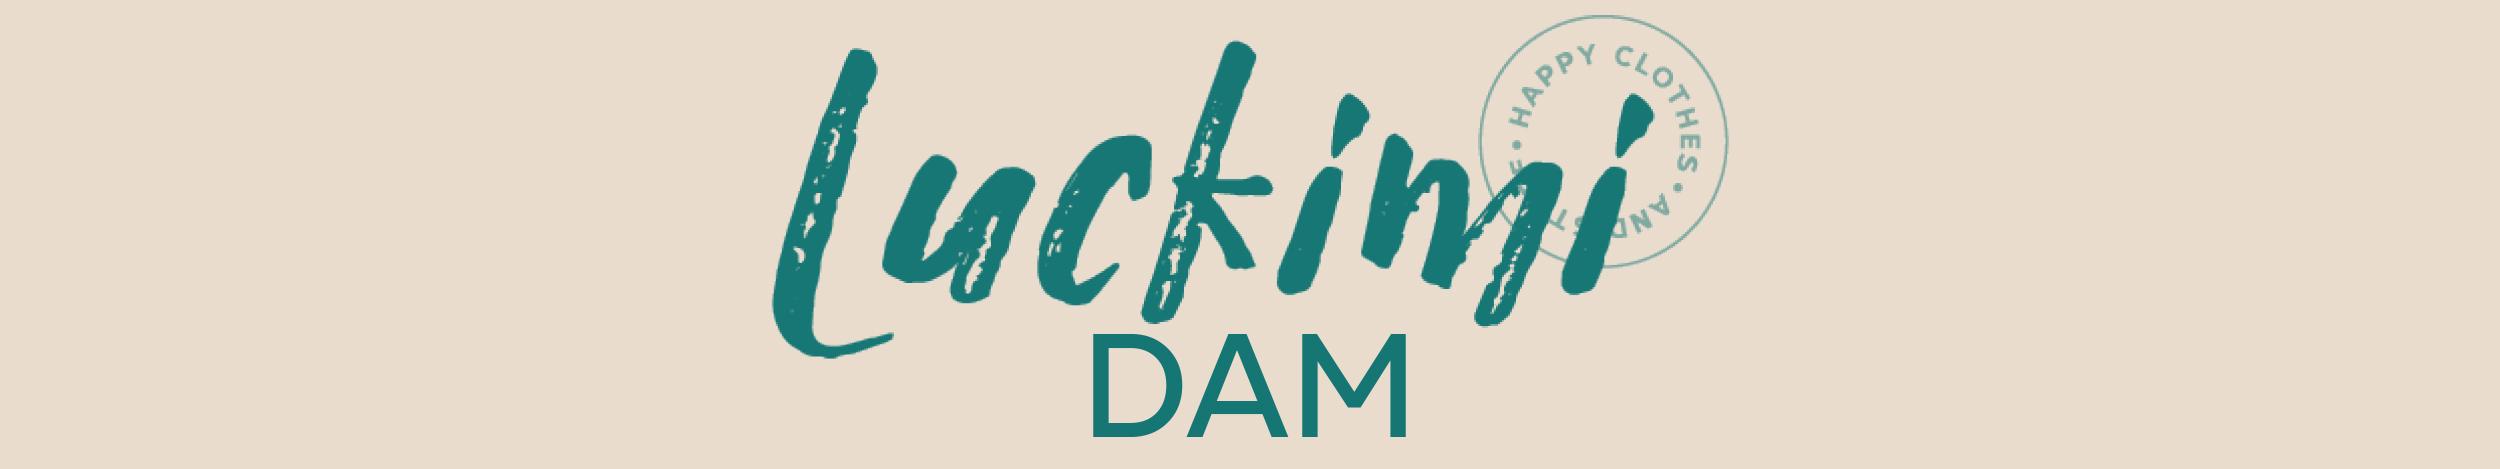 Luckimi dam